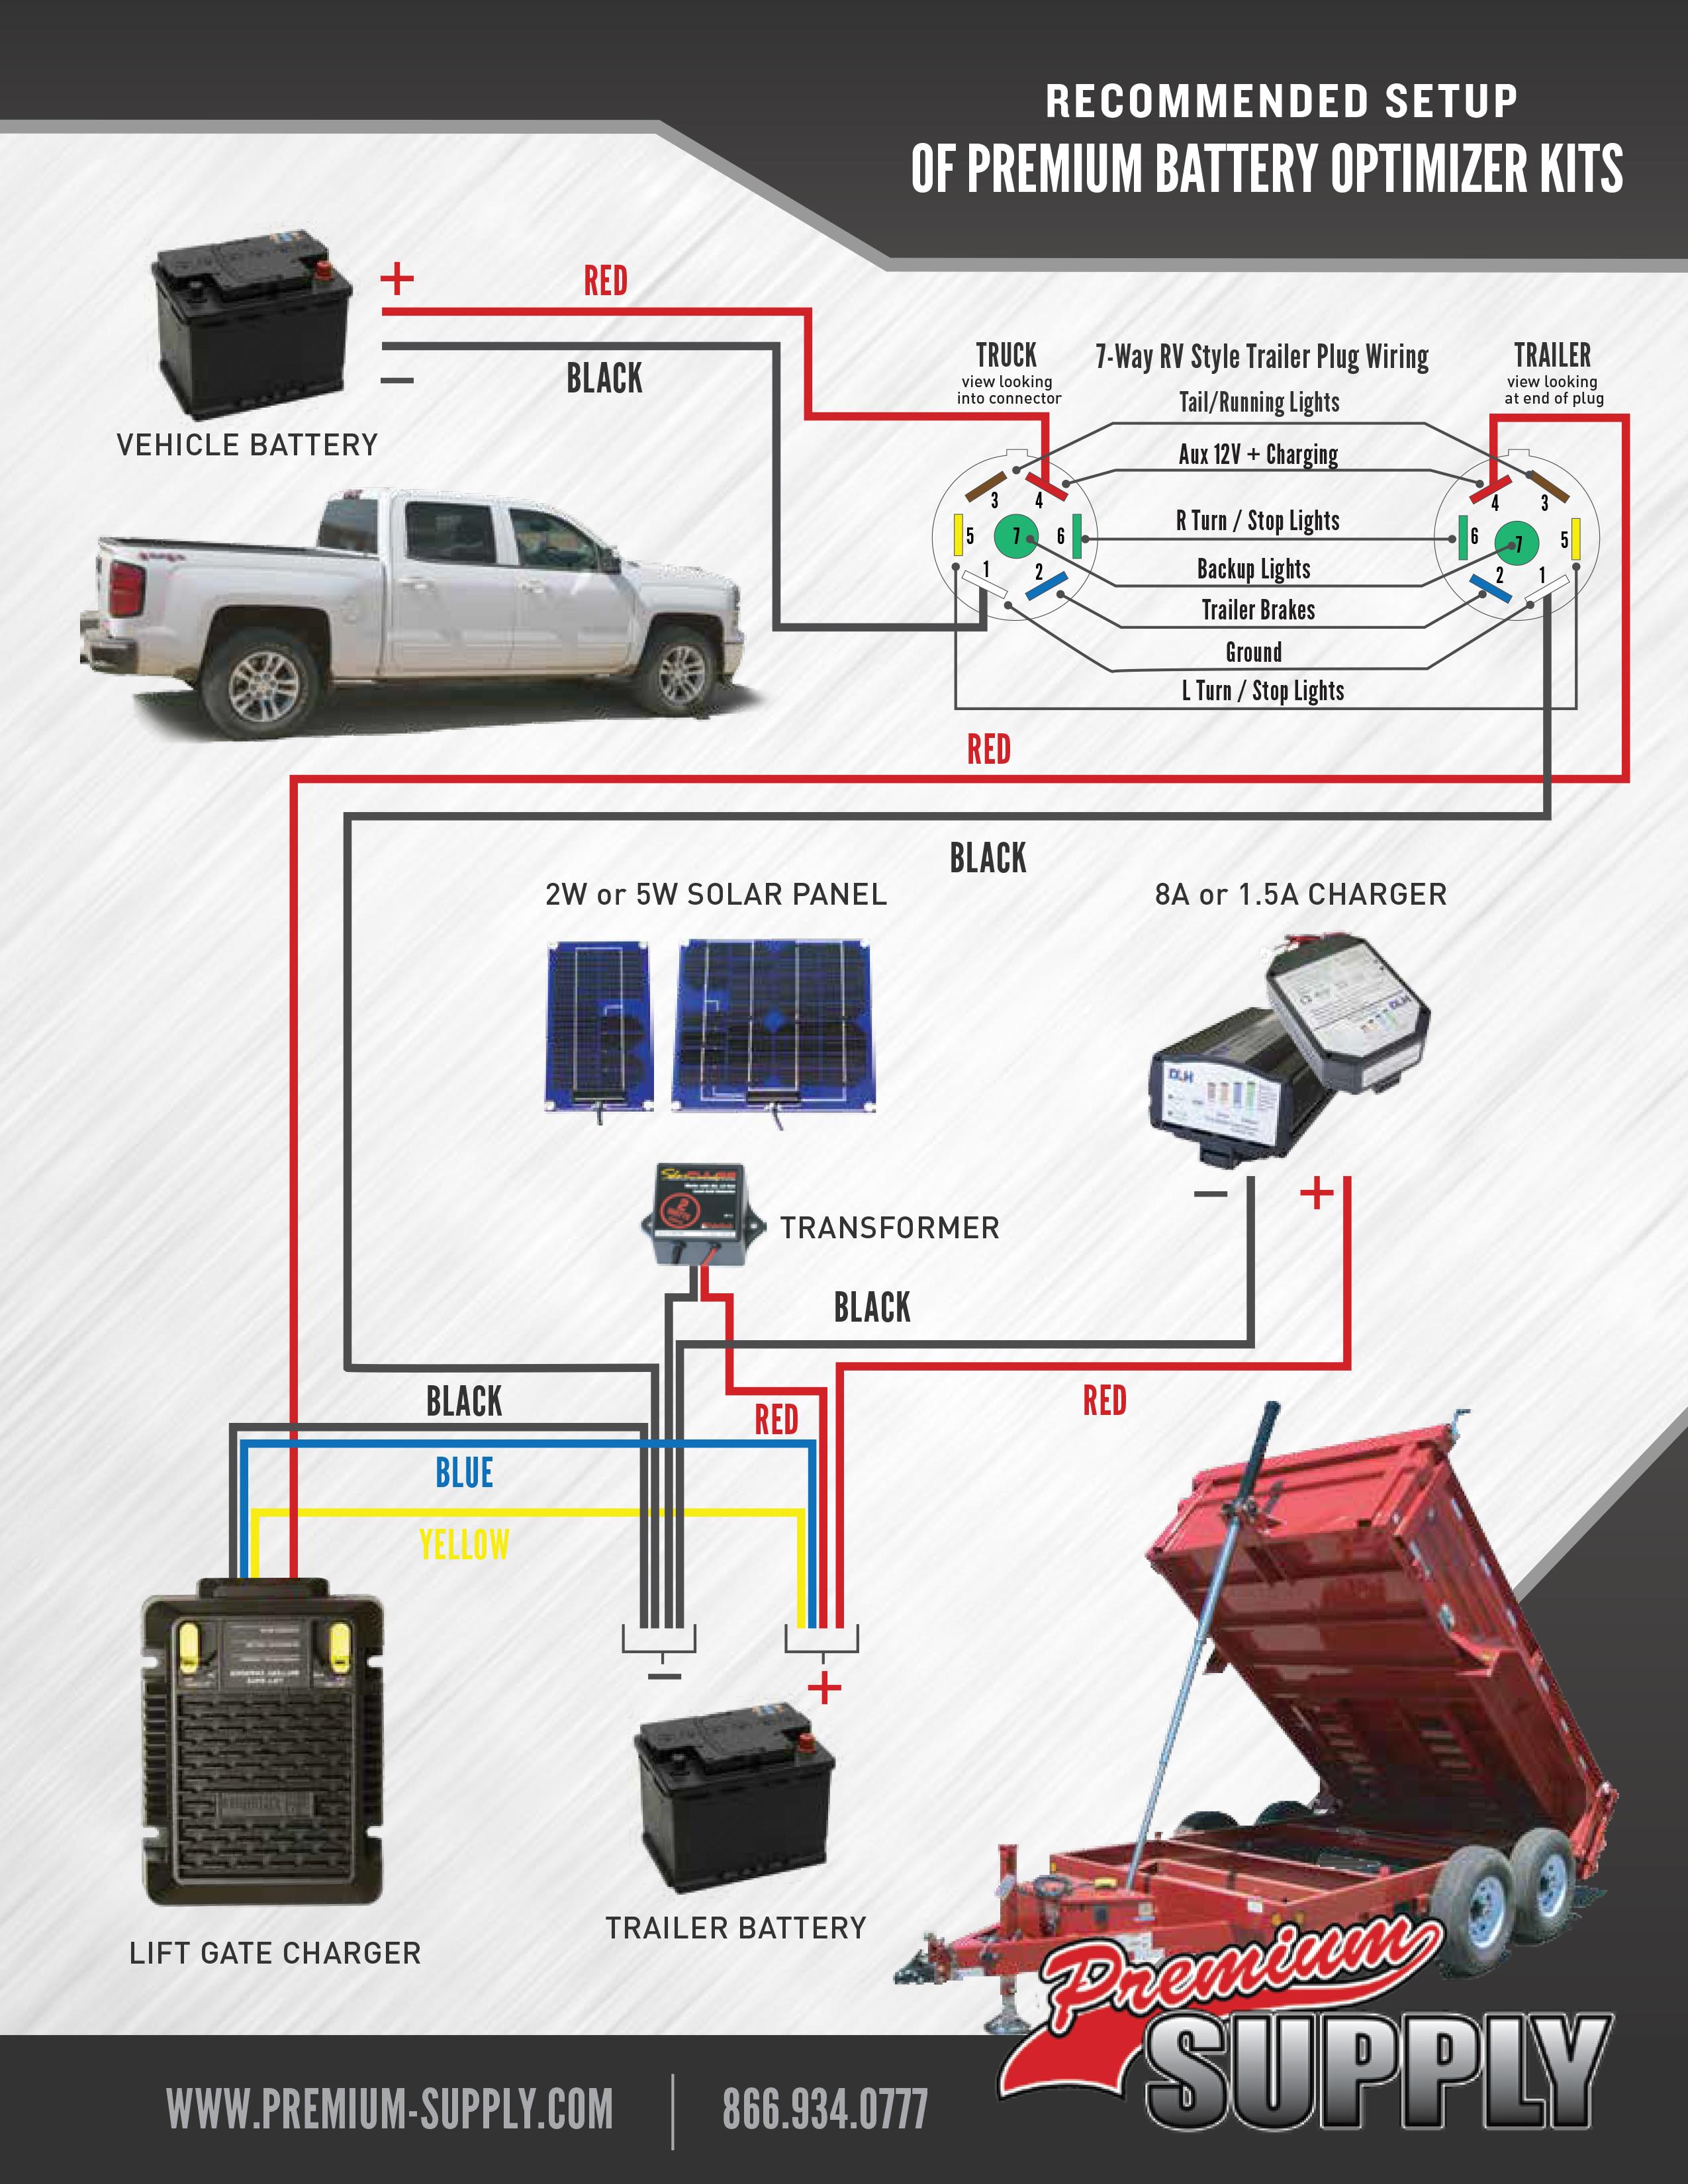 electric trailer jack wiring diagram car stereo centrum bremen hydraulic dump diagrams